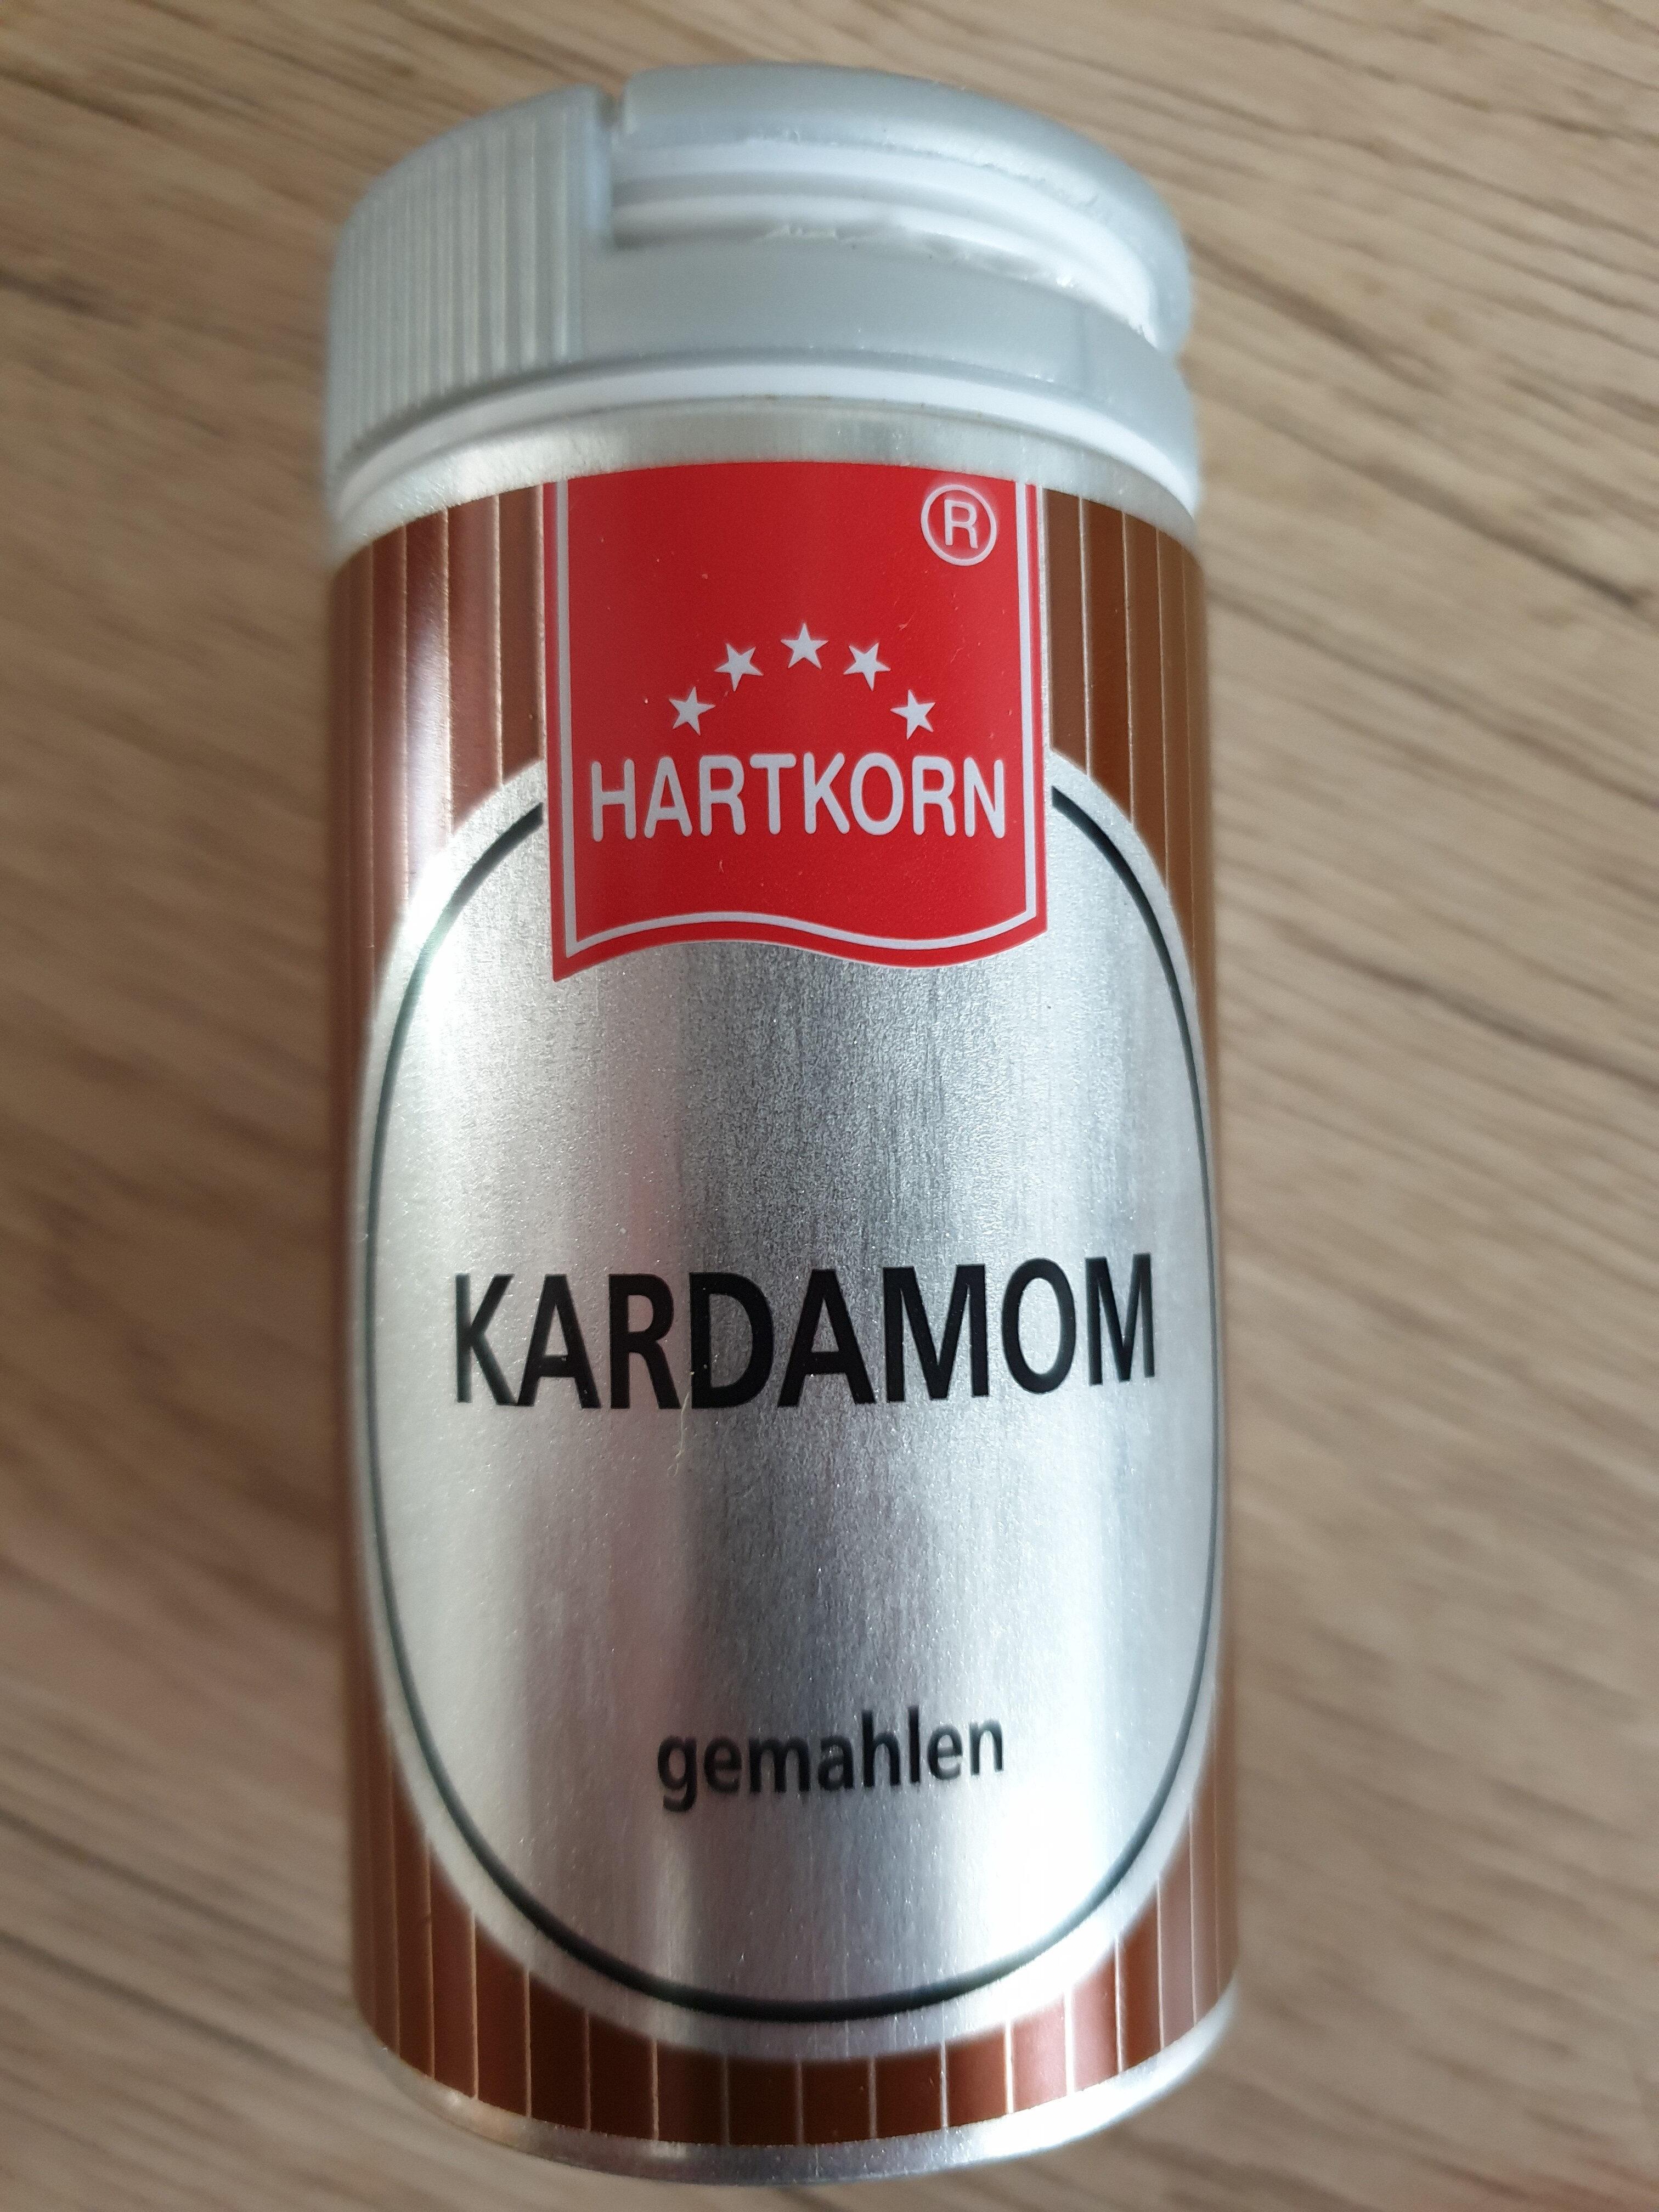 Kardamon, gemahlen - Product